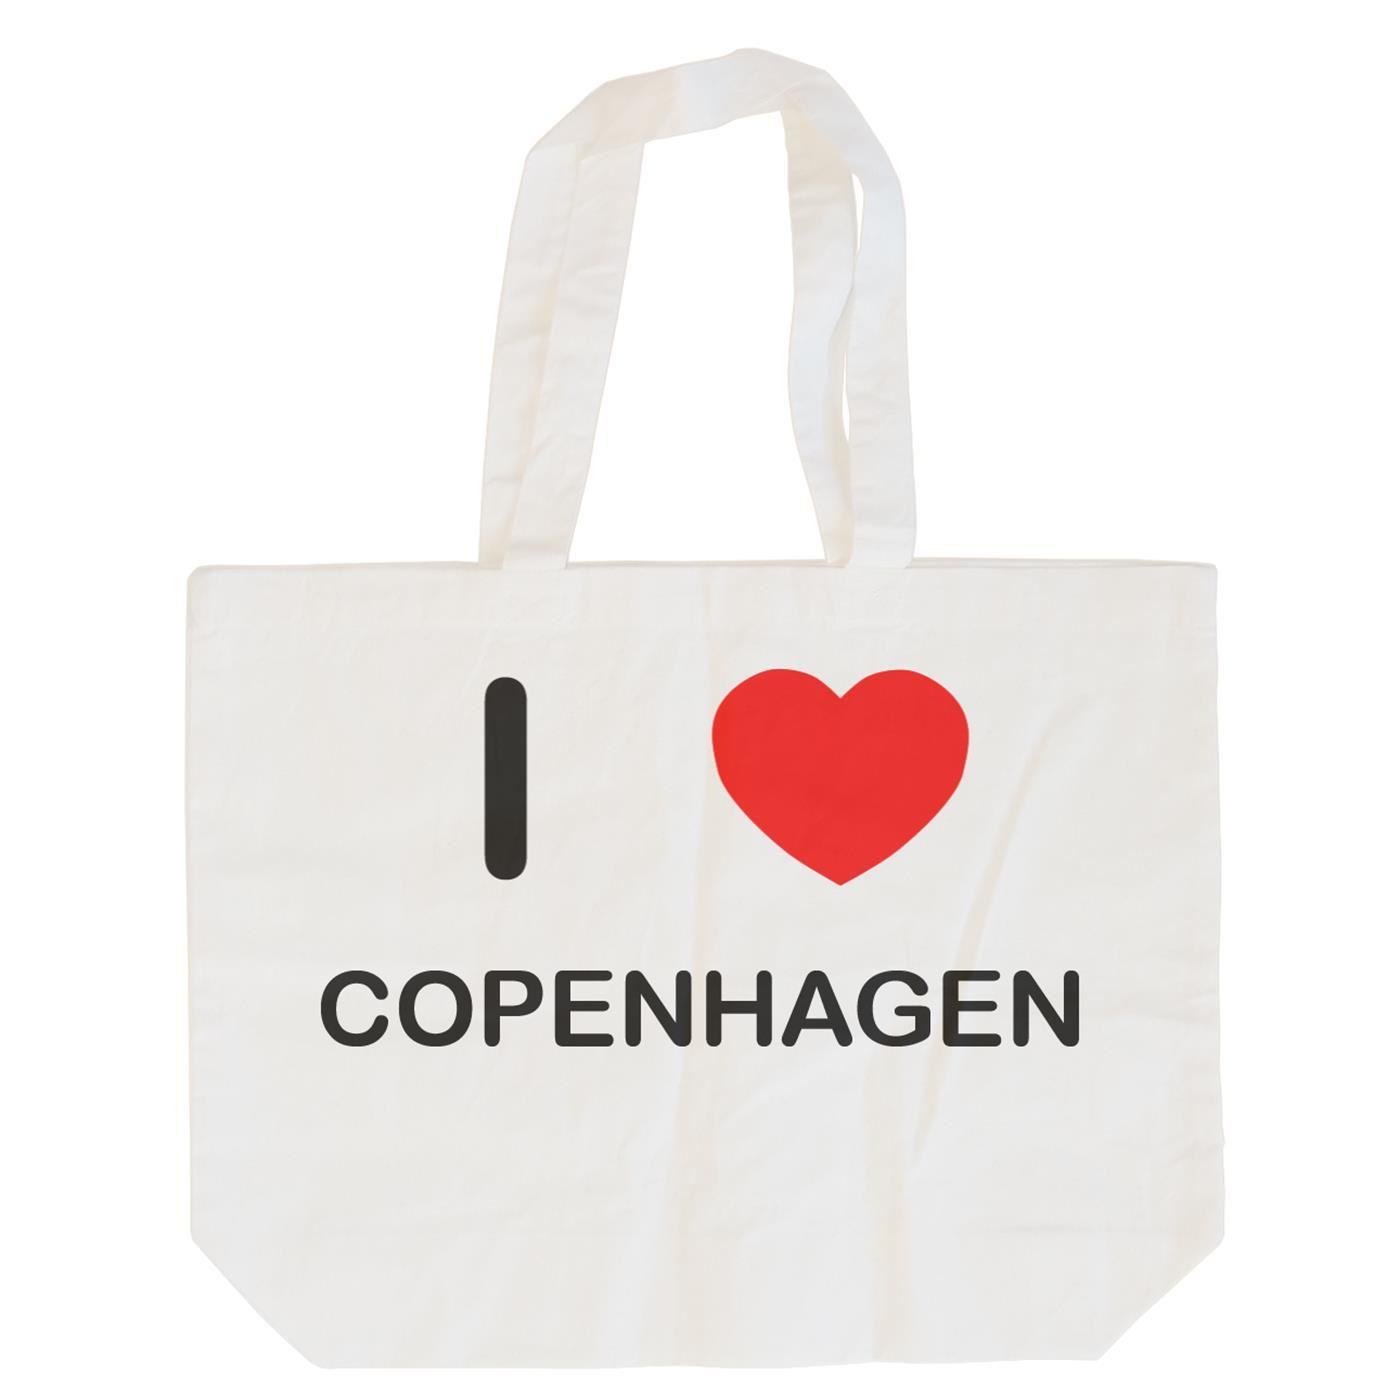 I Love Copenhagen - Cotton Bag | Size choice Tote, Shopper or Sling